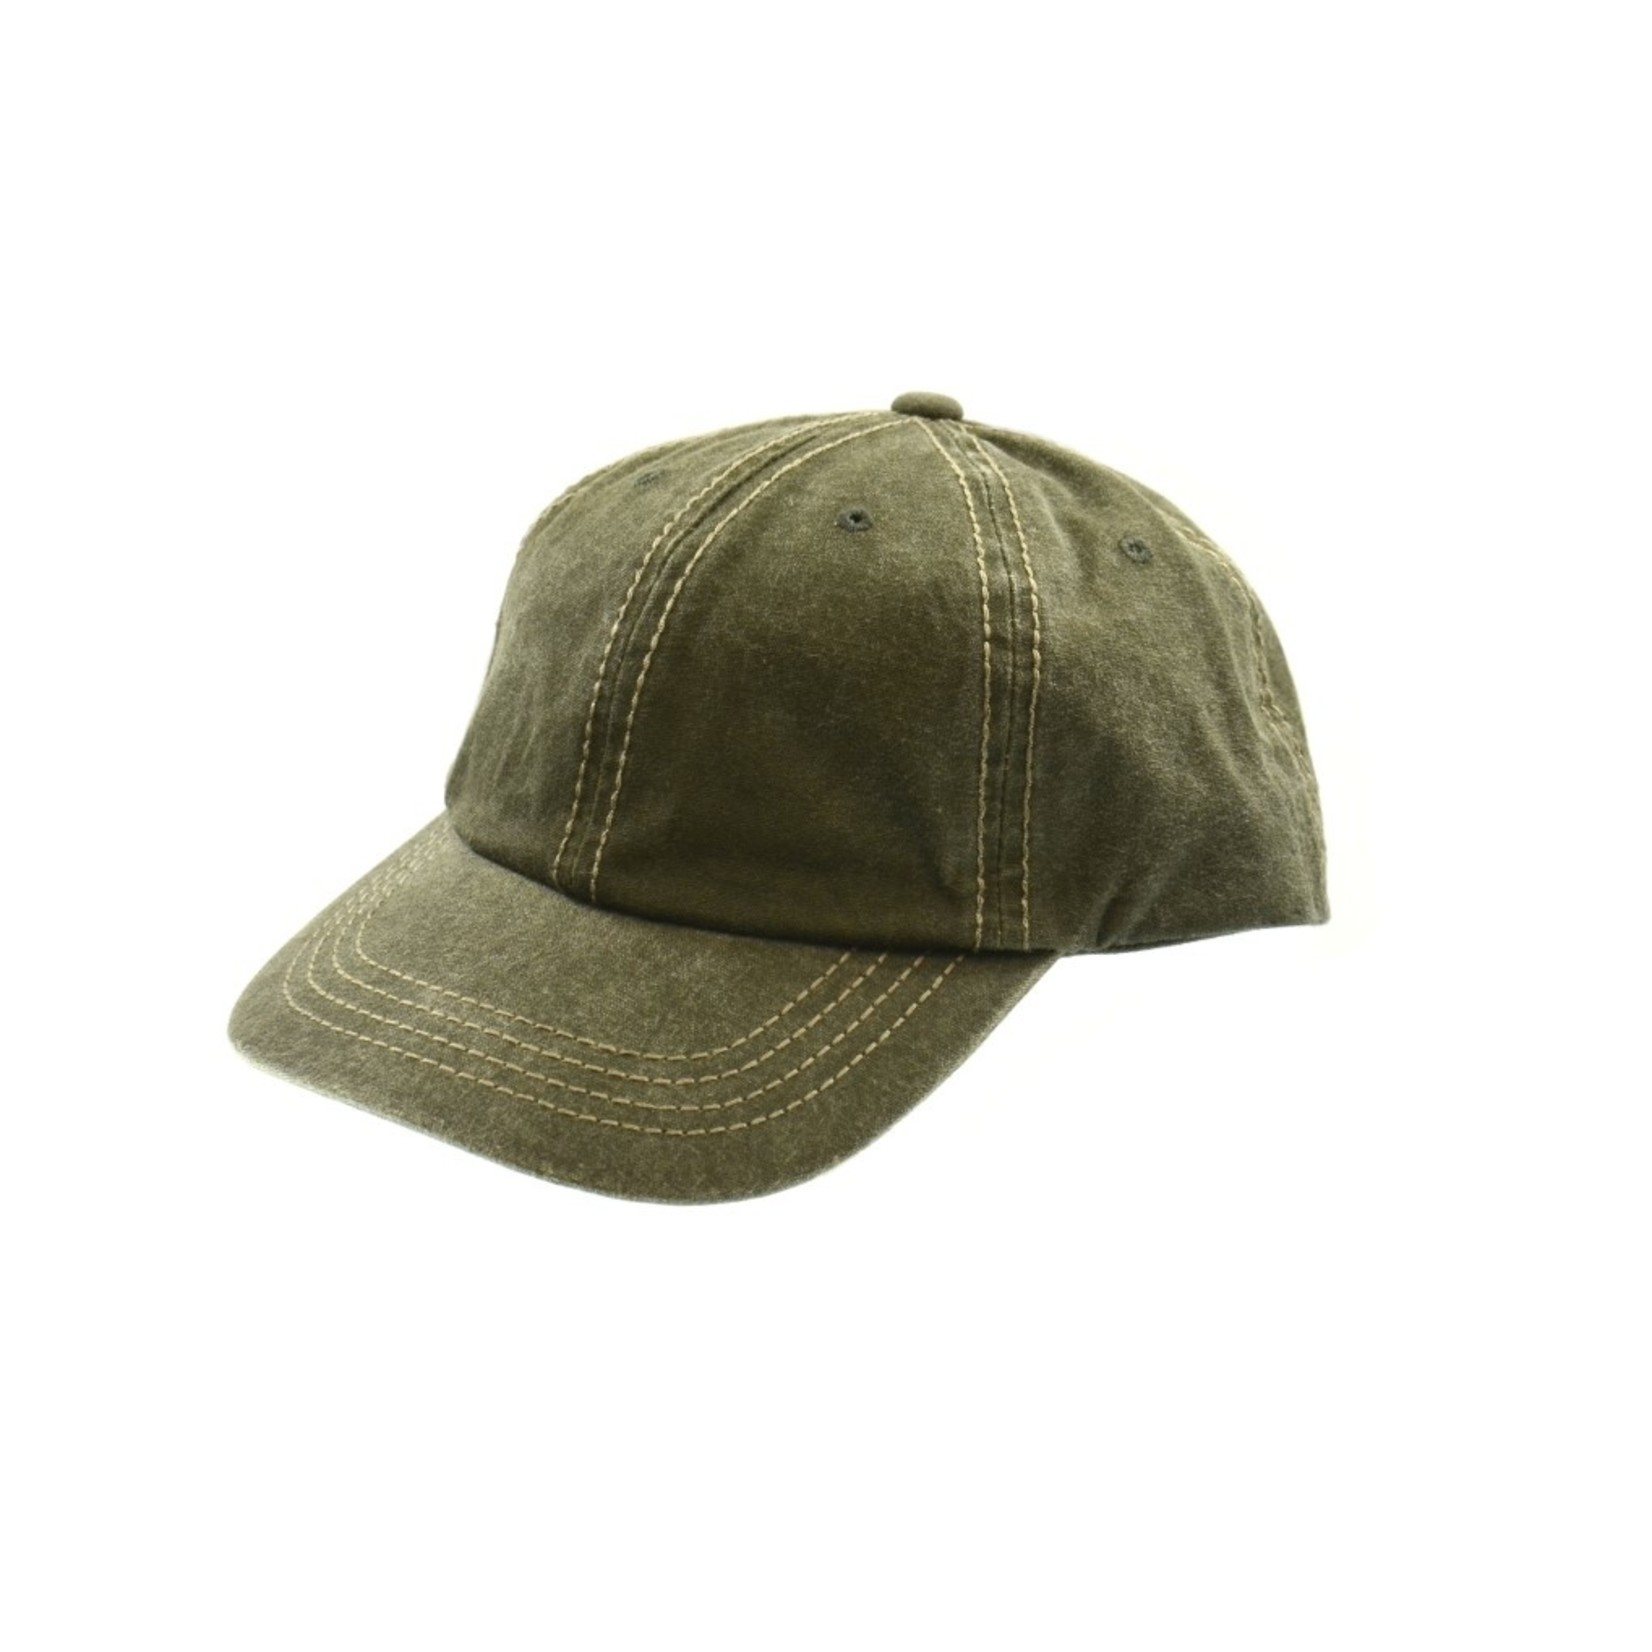 Crowncap 5-10136 Washed Pigment Dyed Adj Baseball Cap 625 Cream